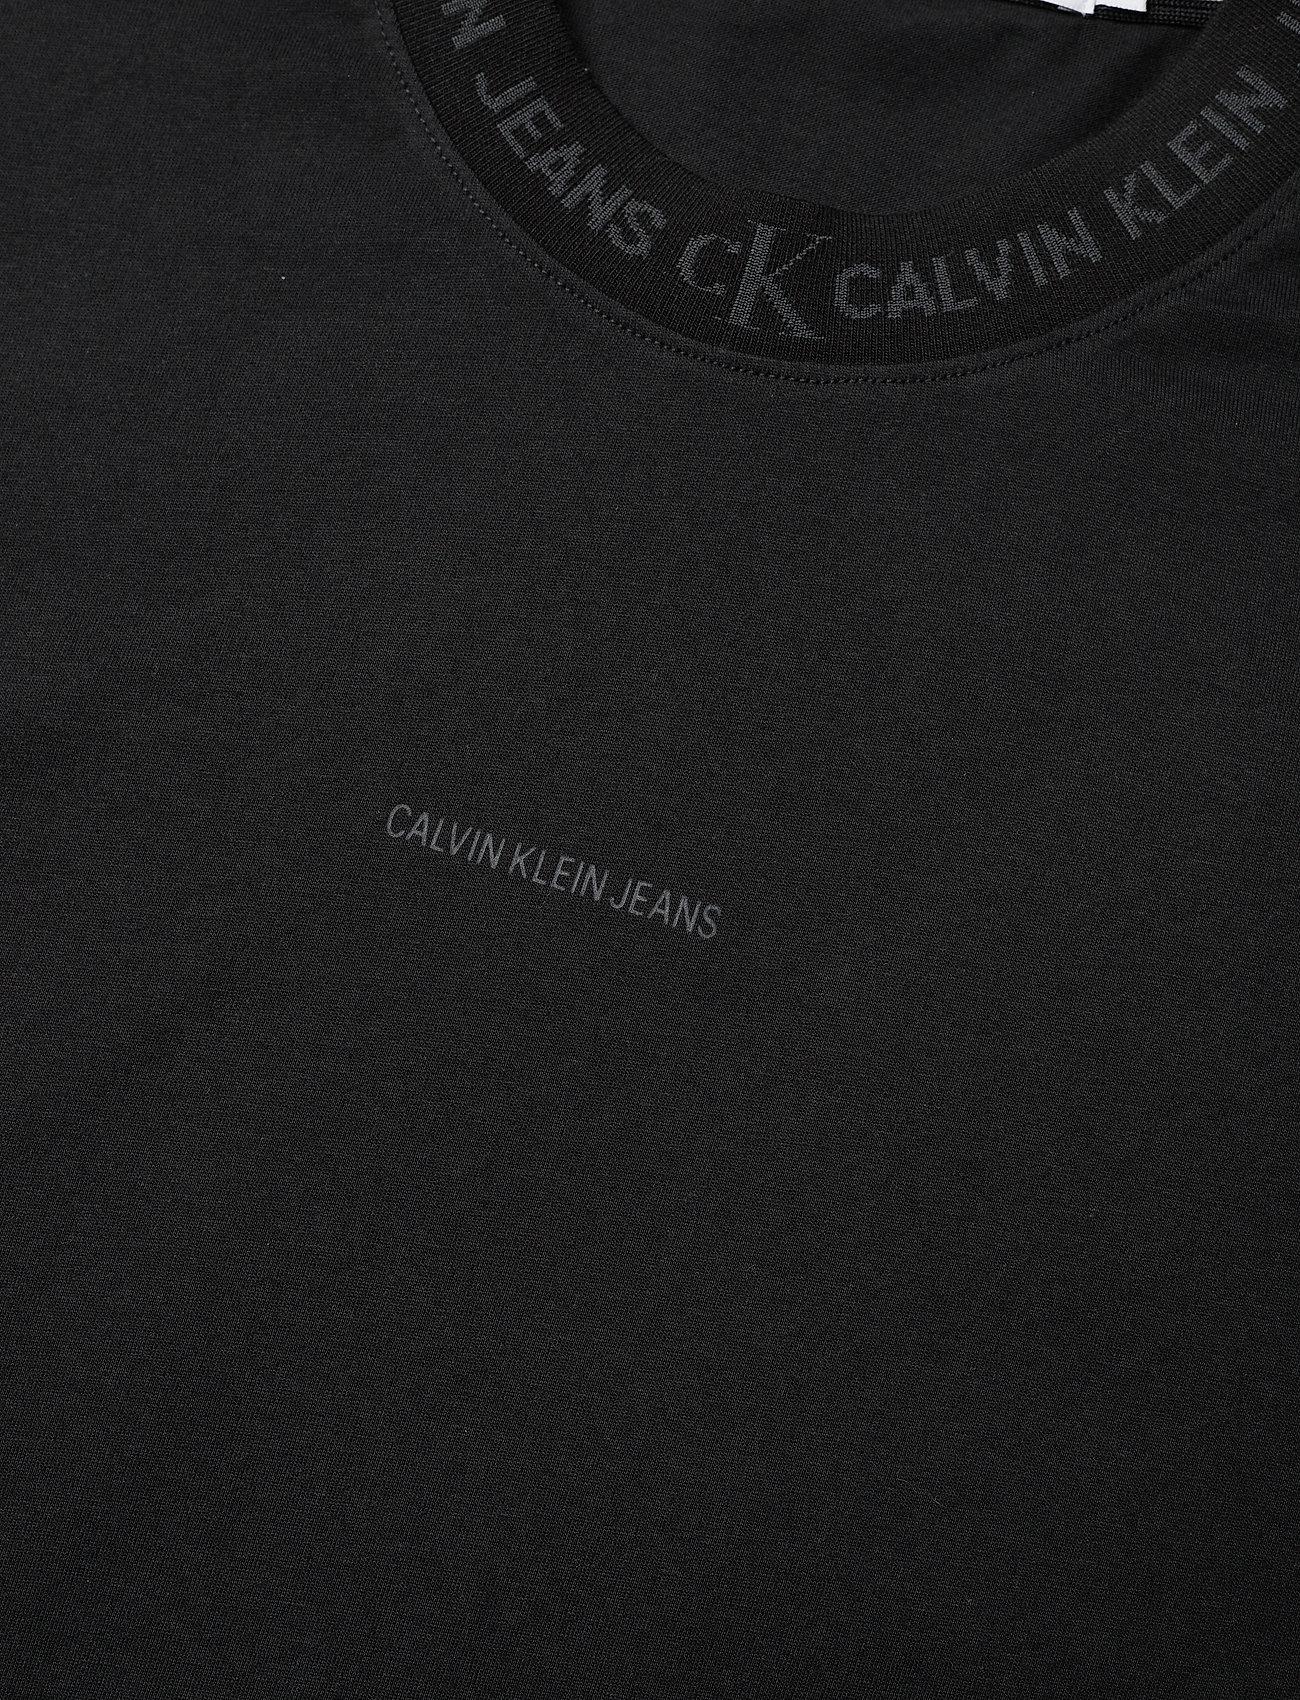 Calvin Klein Jeans - LOGO JACQUARD TEE - t-shirts basiques - ck black - 2